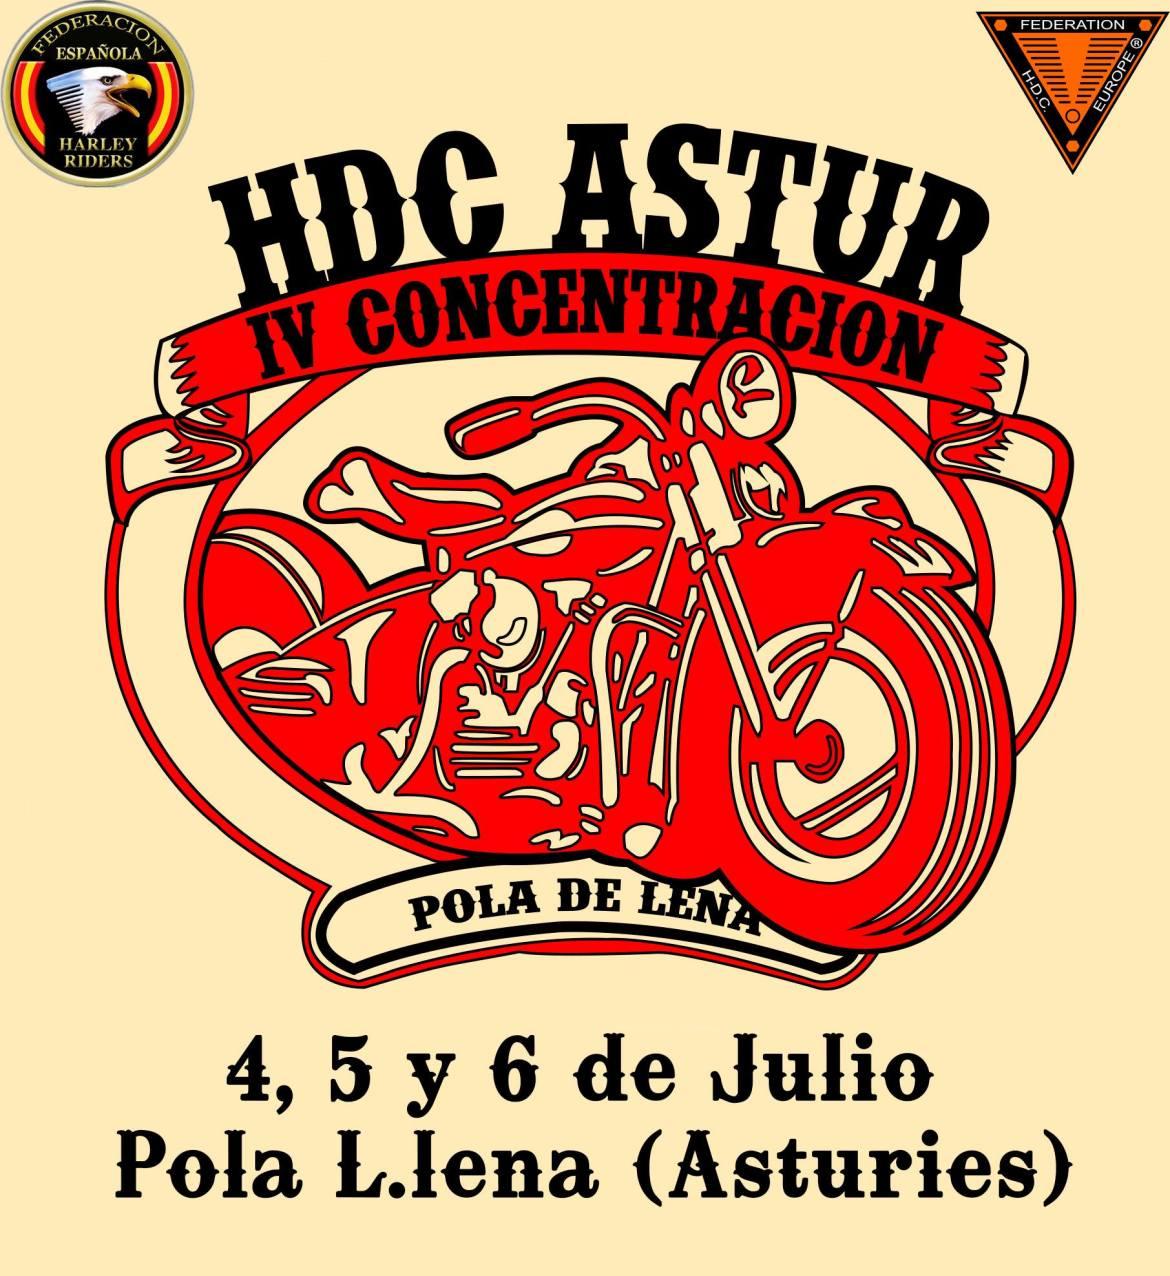 IV Concentración HDC Astur - Pola de Lena (Asturies)